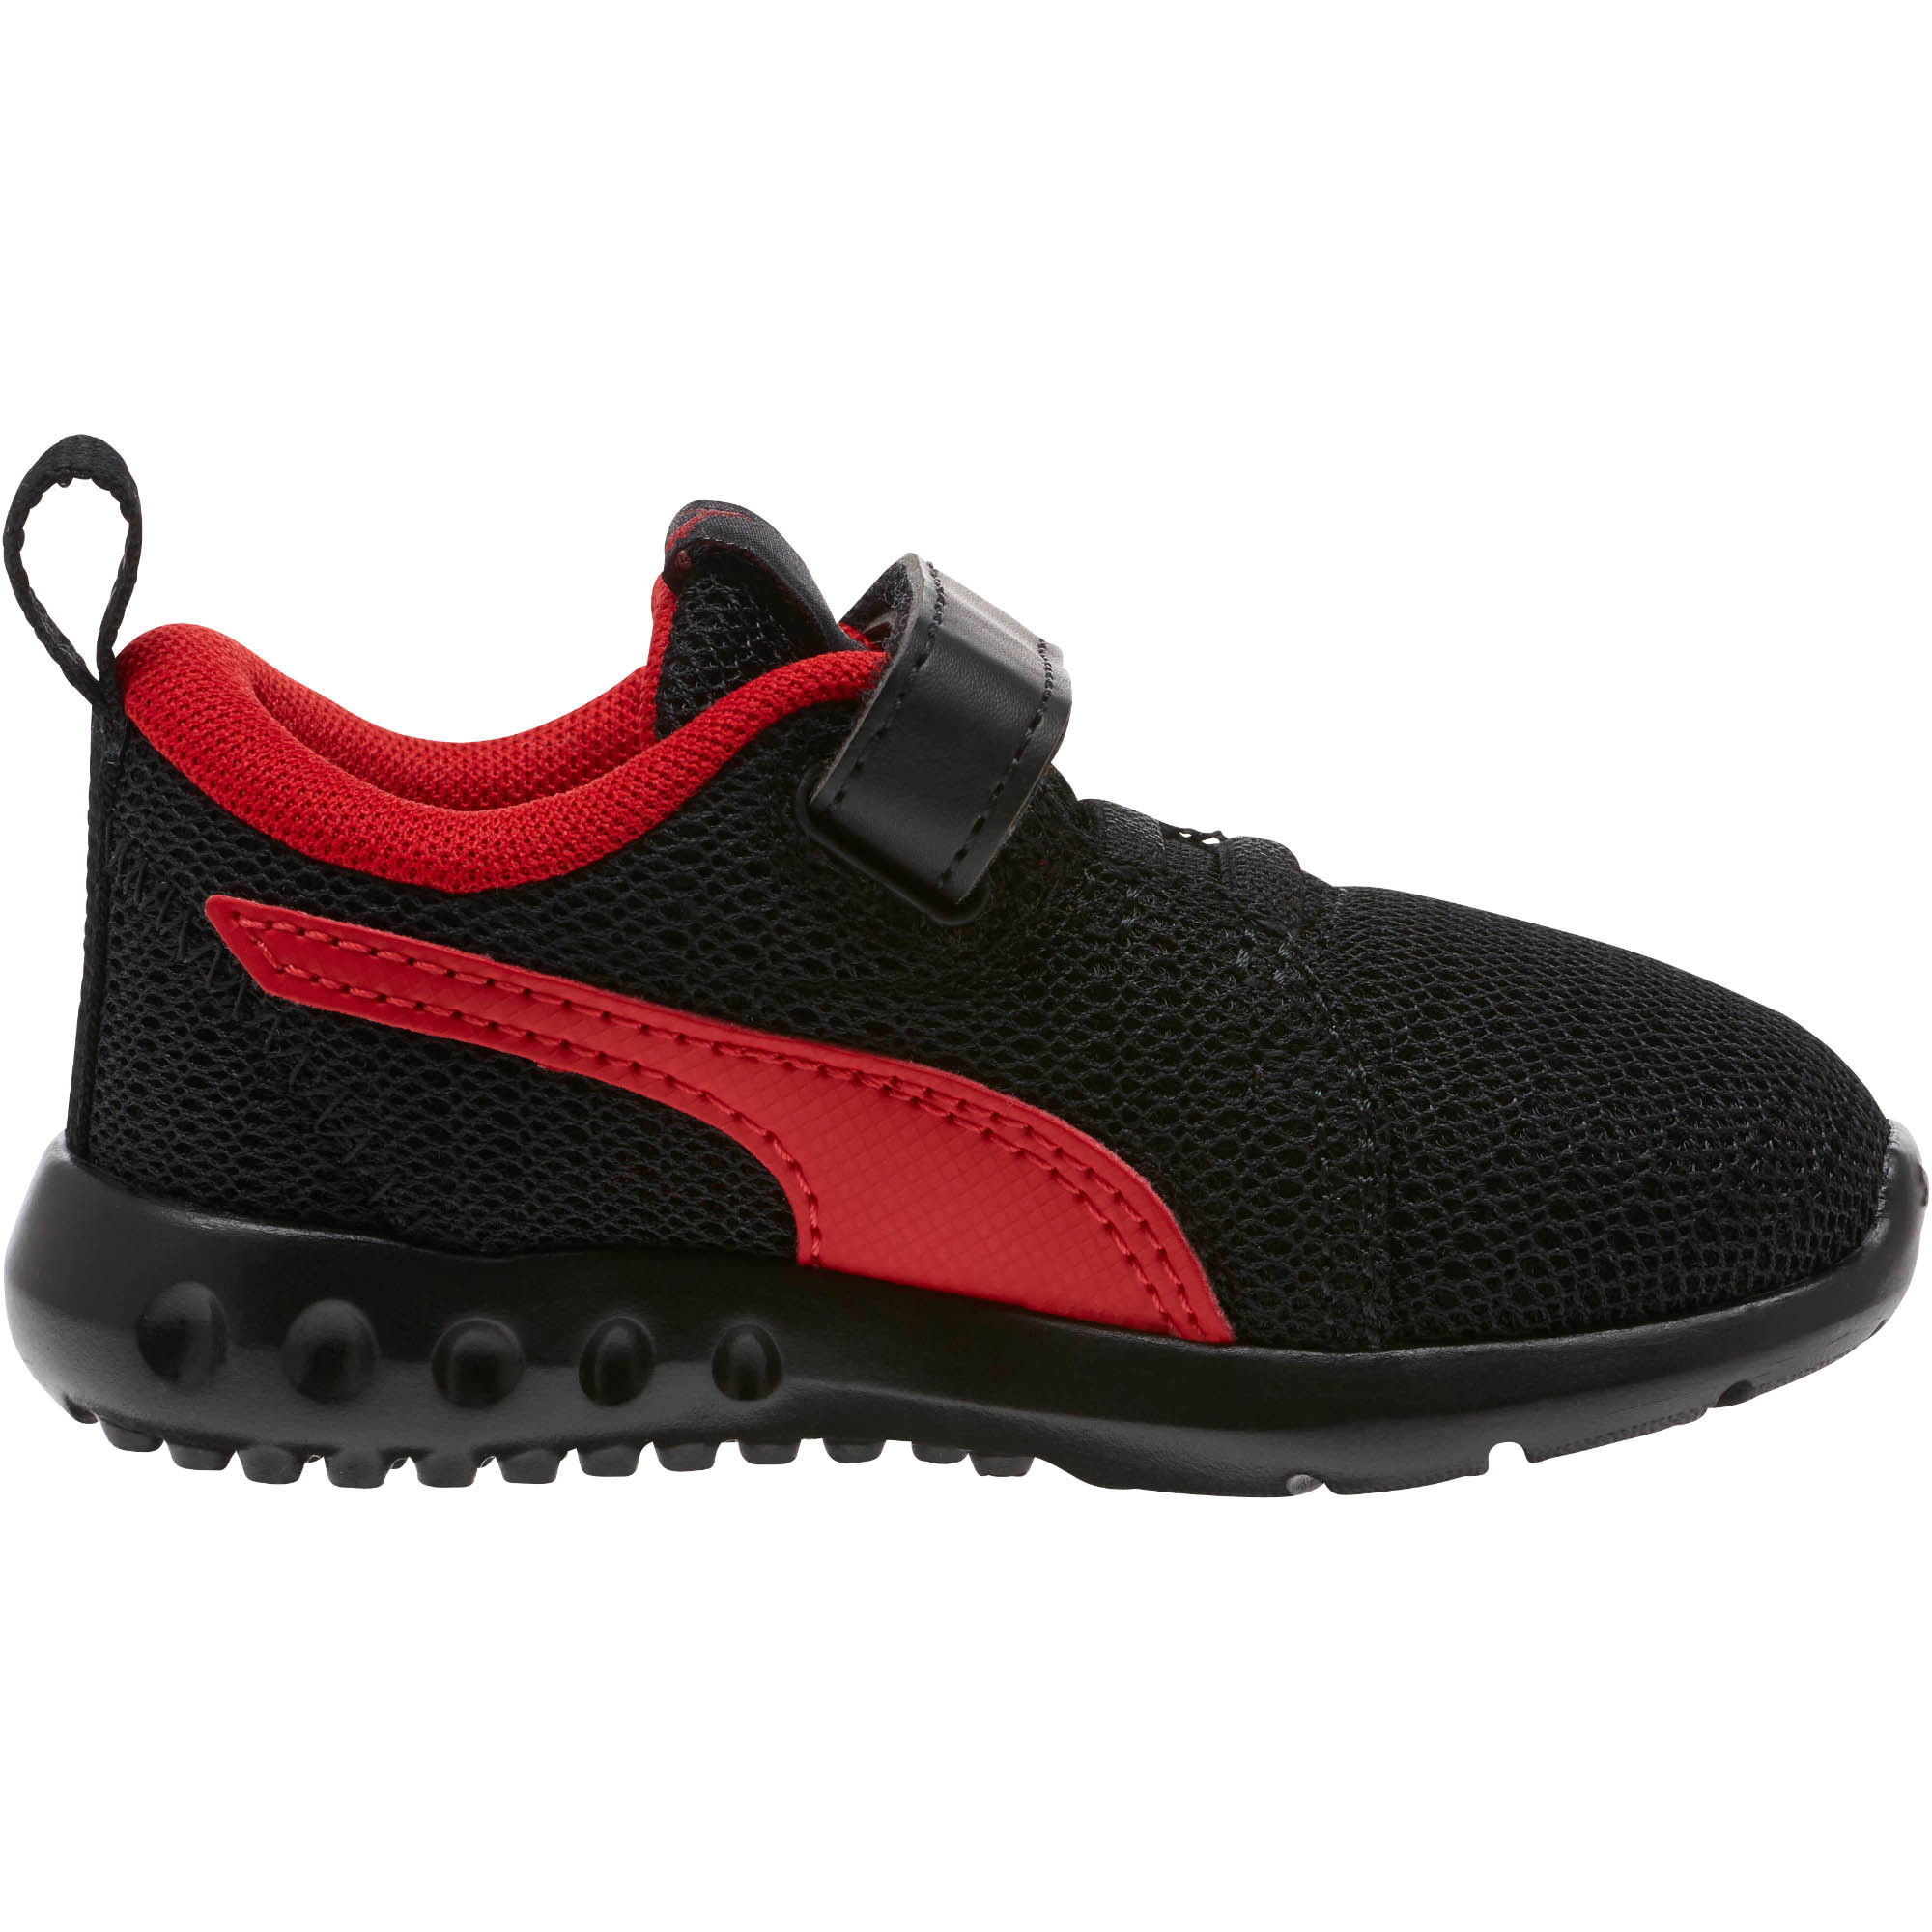 PUMA-Carson-2-Toddler-Shoes-Unisex-Shoe-Kids thumbnail 19